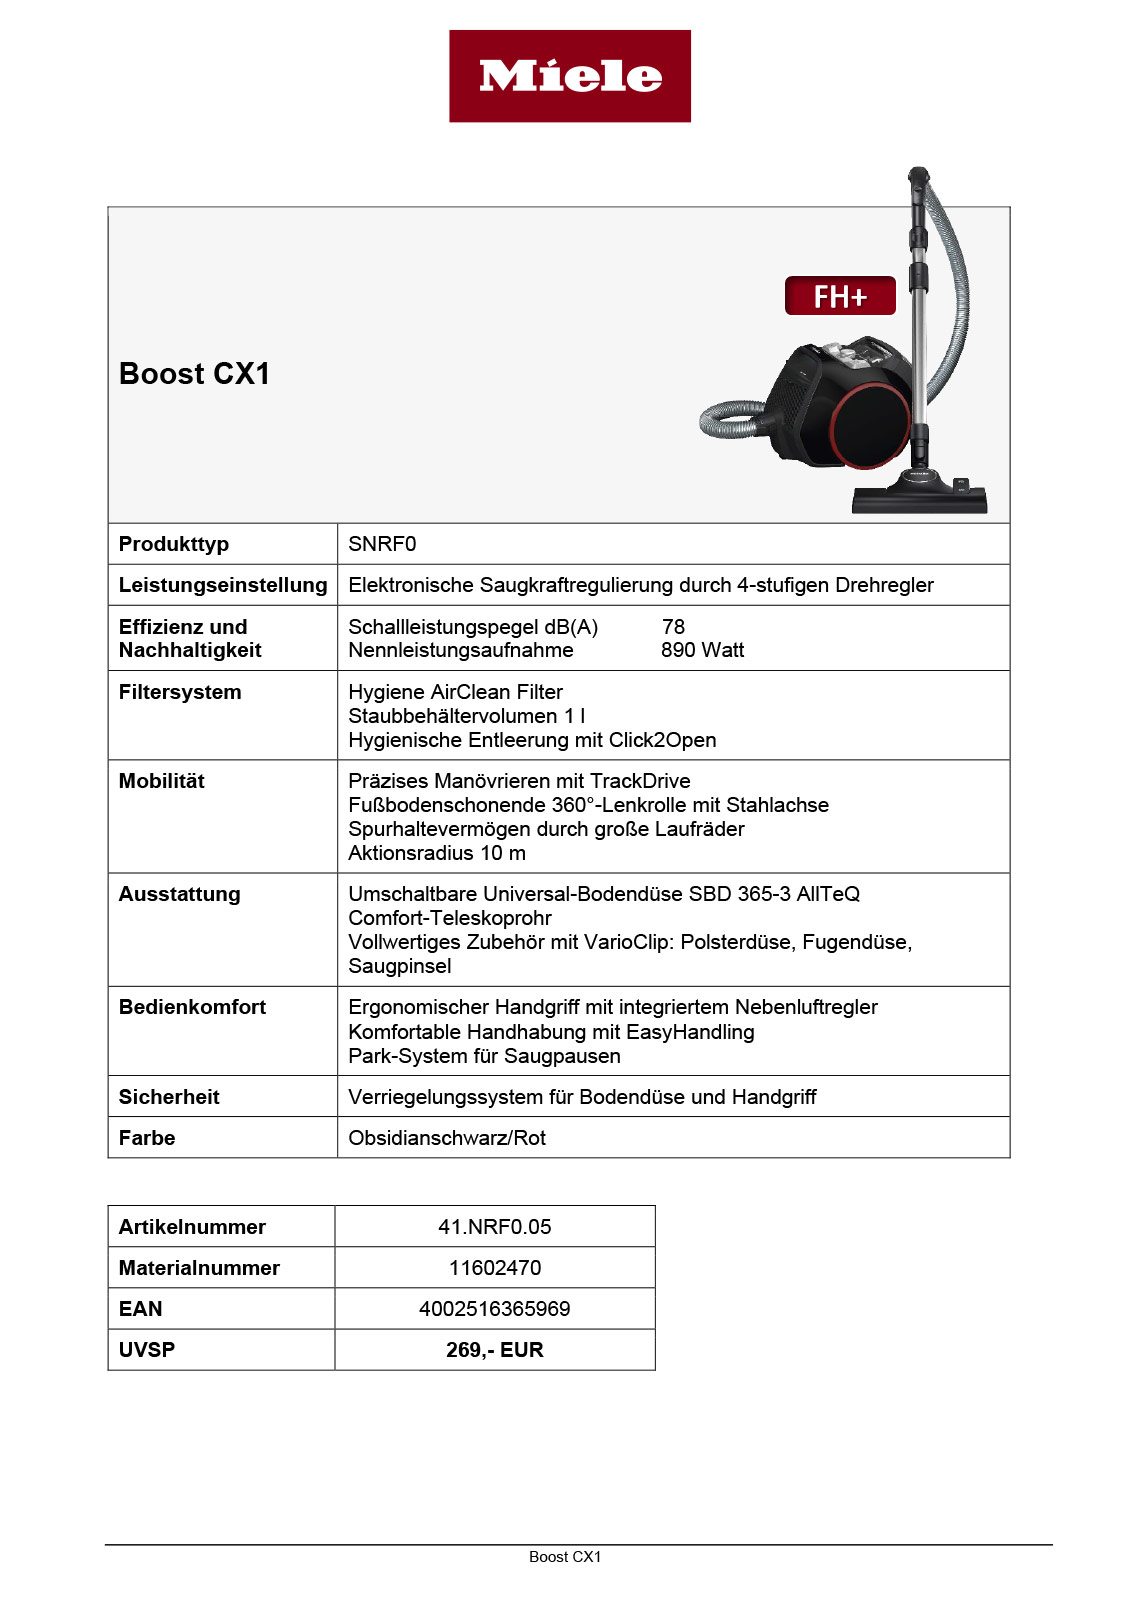 Miele Boost CX1 Datenblätter